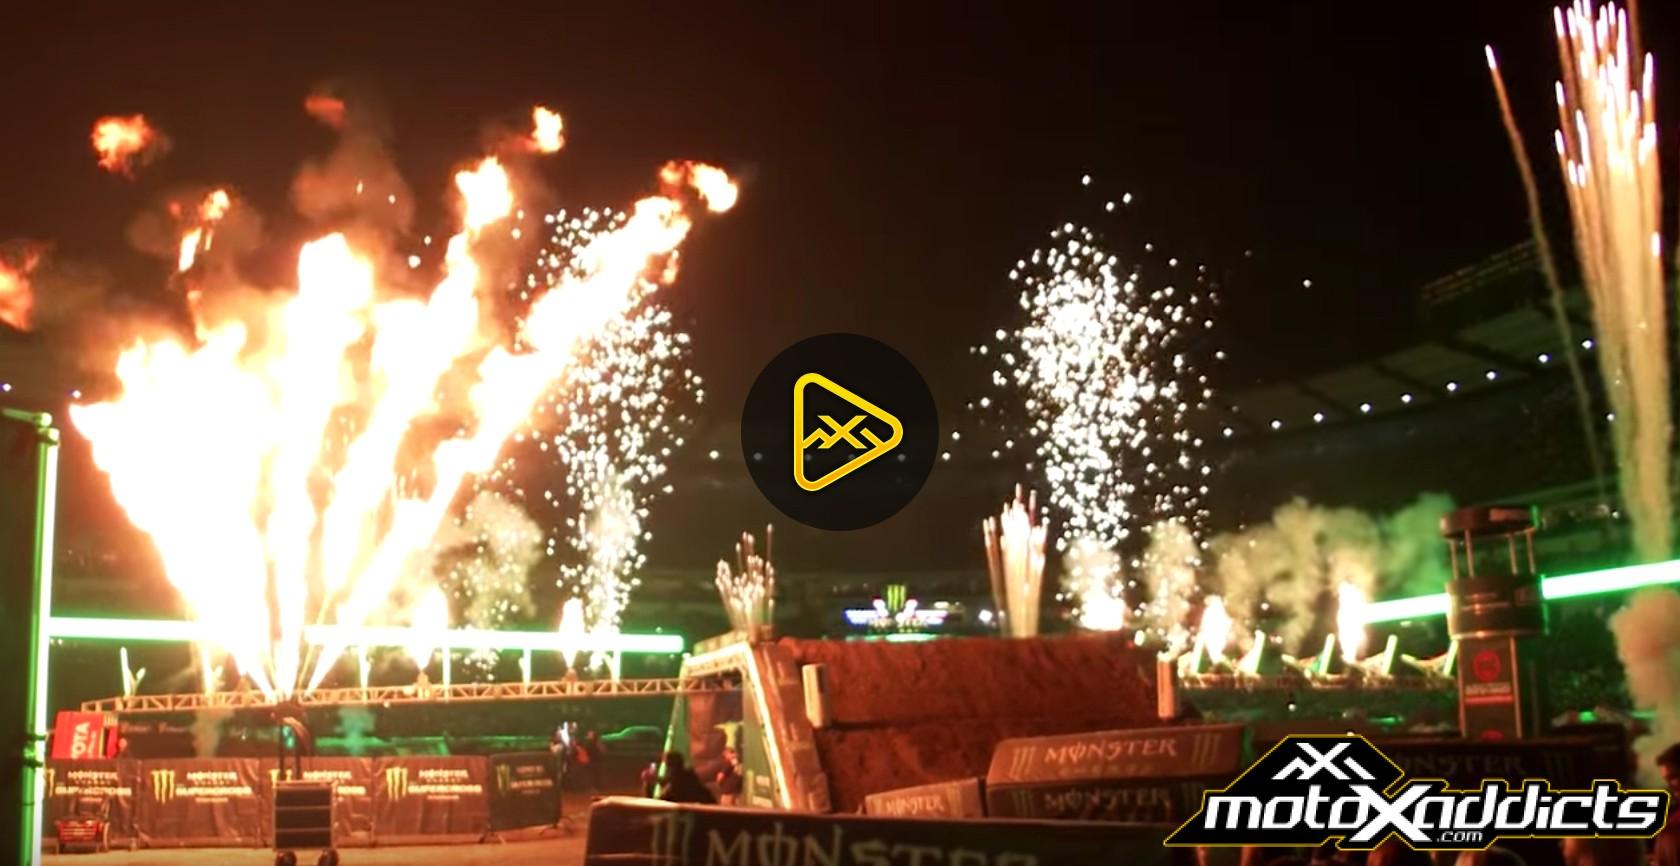 Anaheim Opening Ceremonies: Chasing the Dream – Xtra